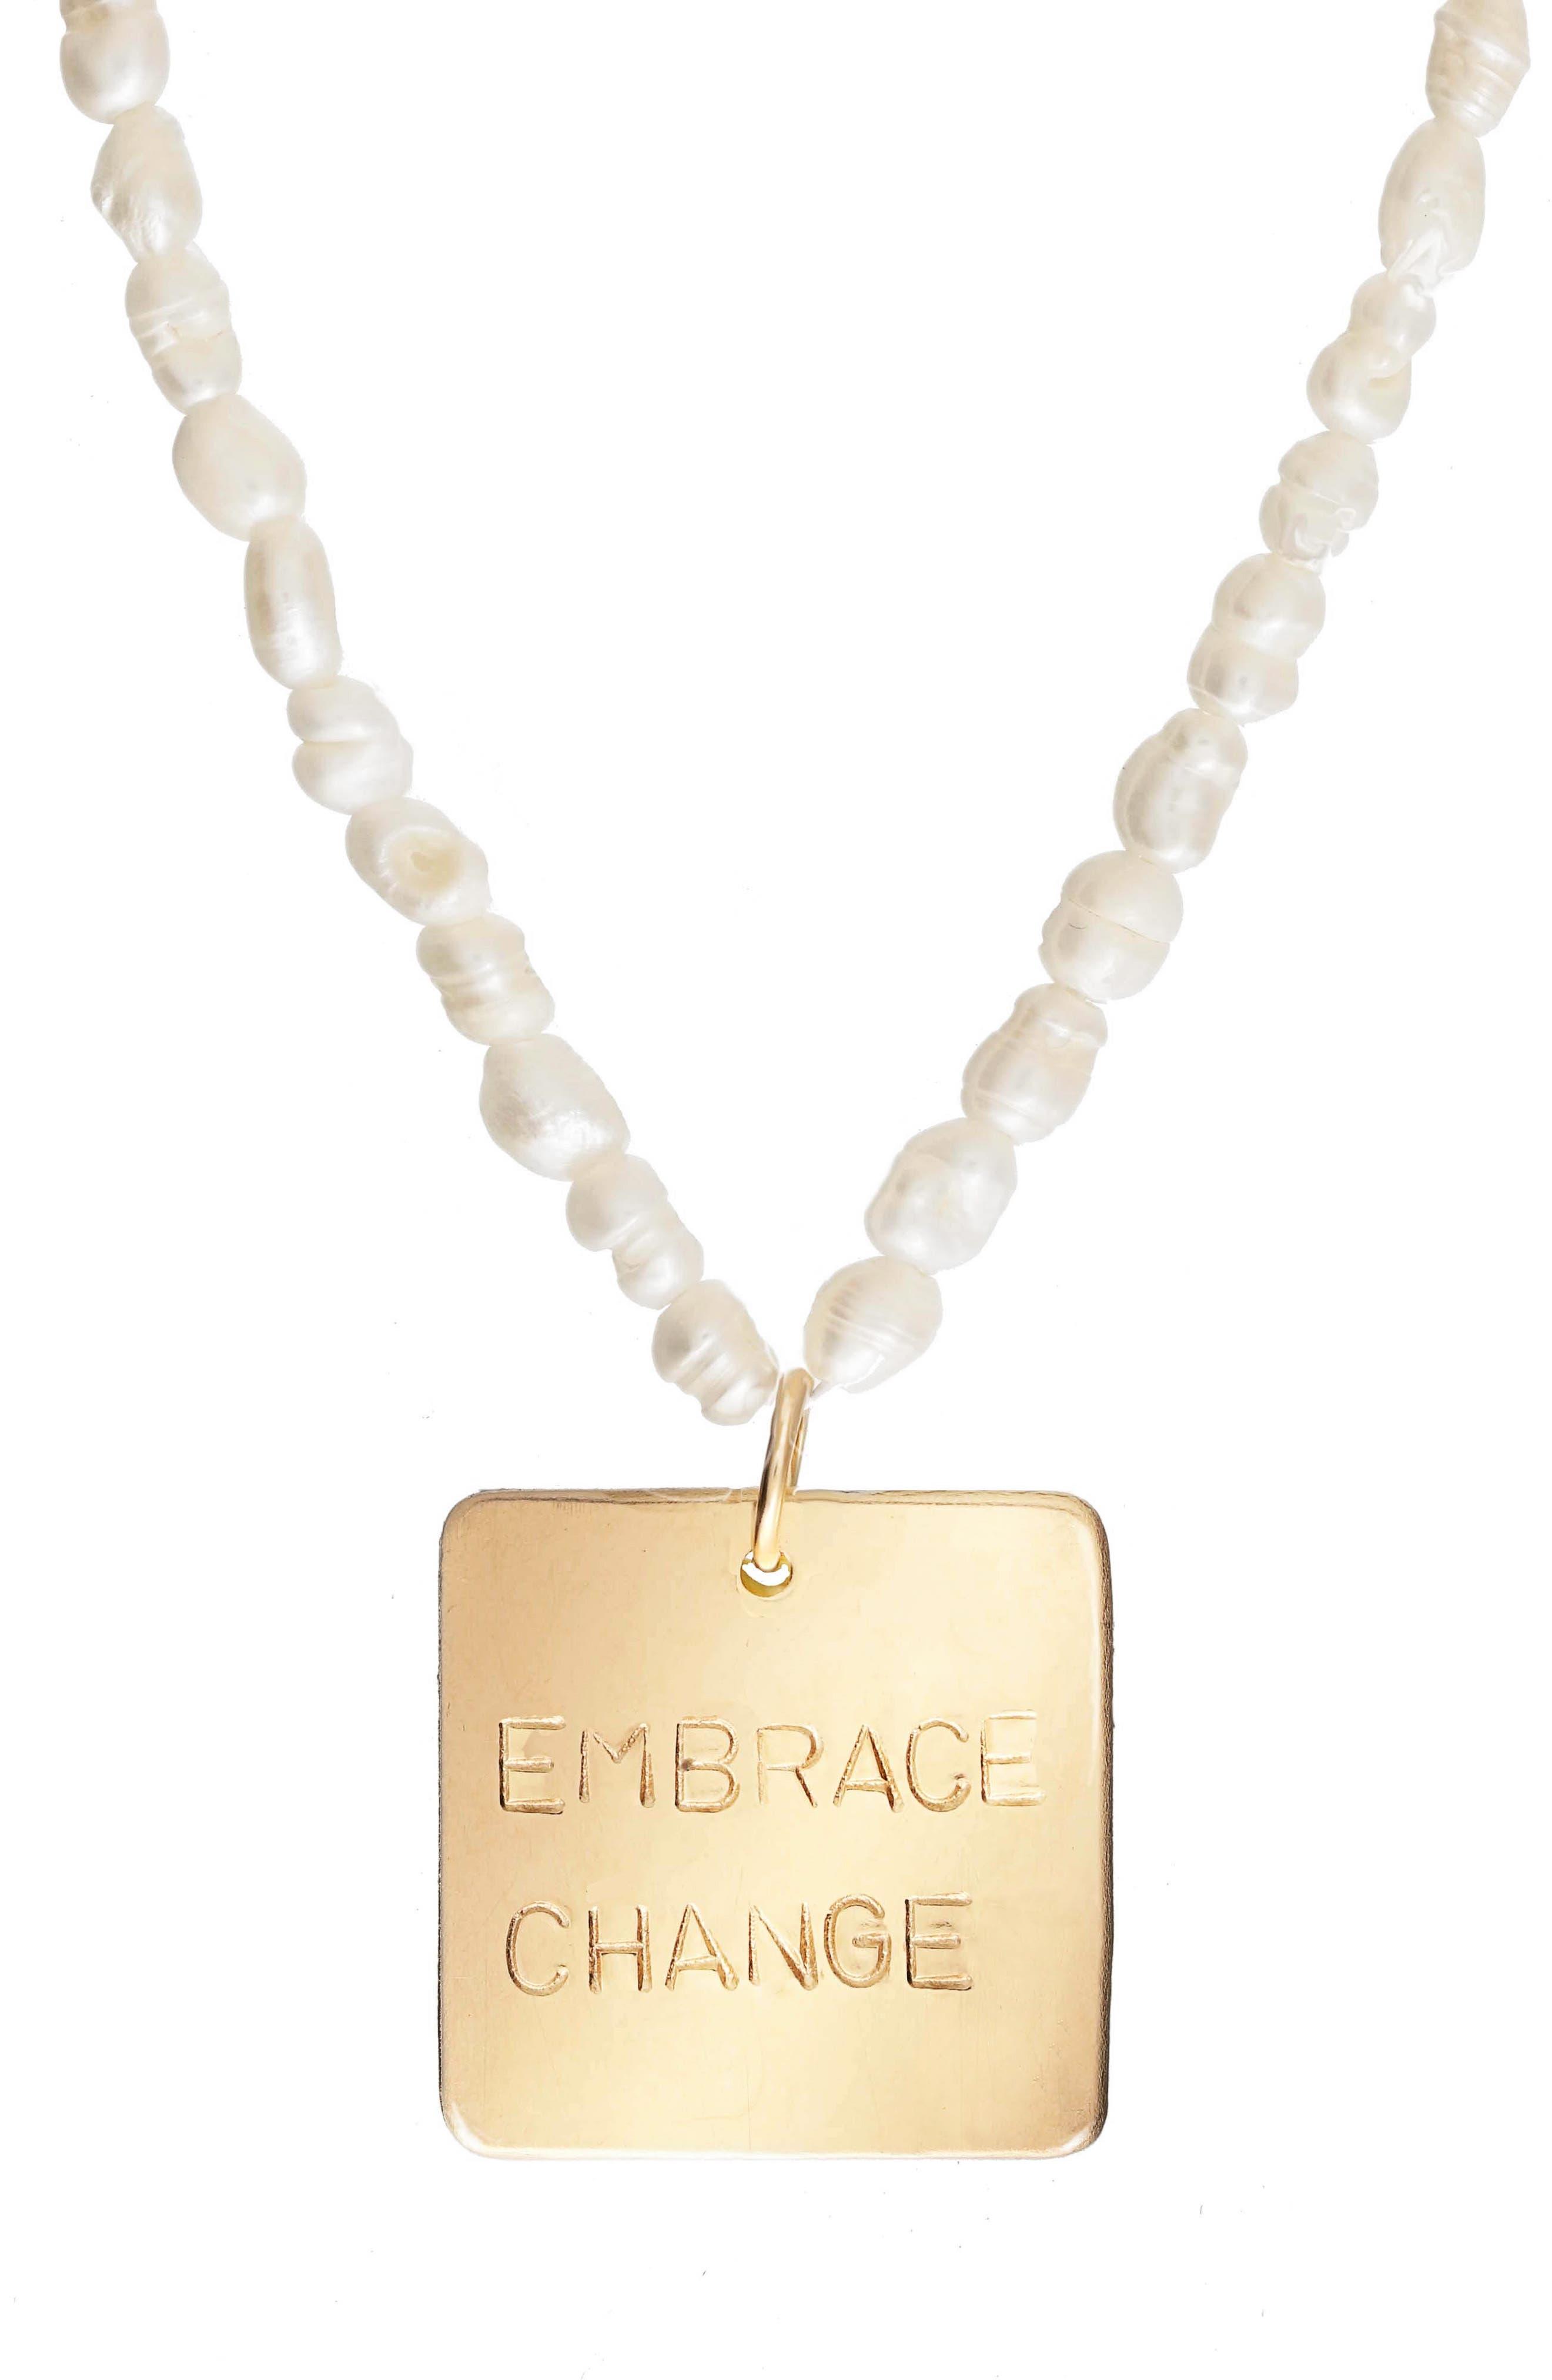 Embrace Change Necklace